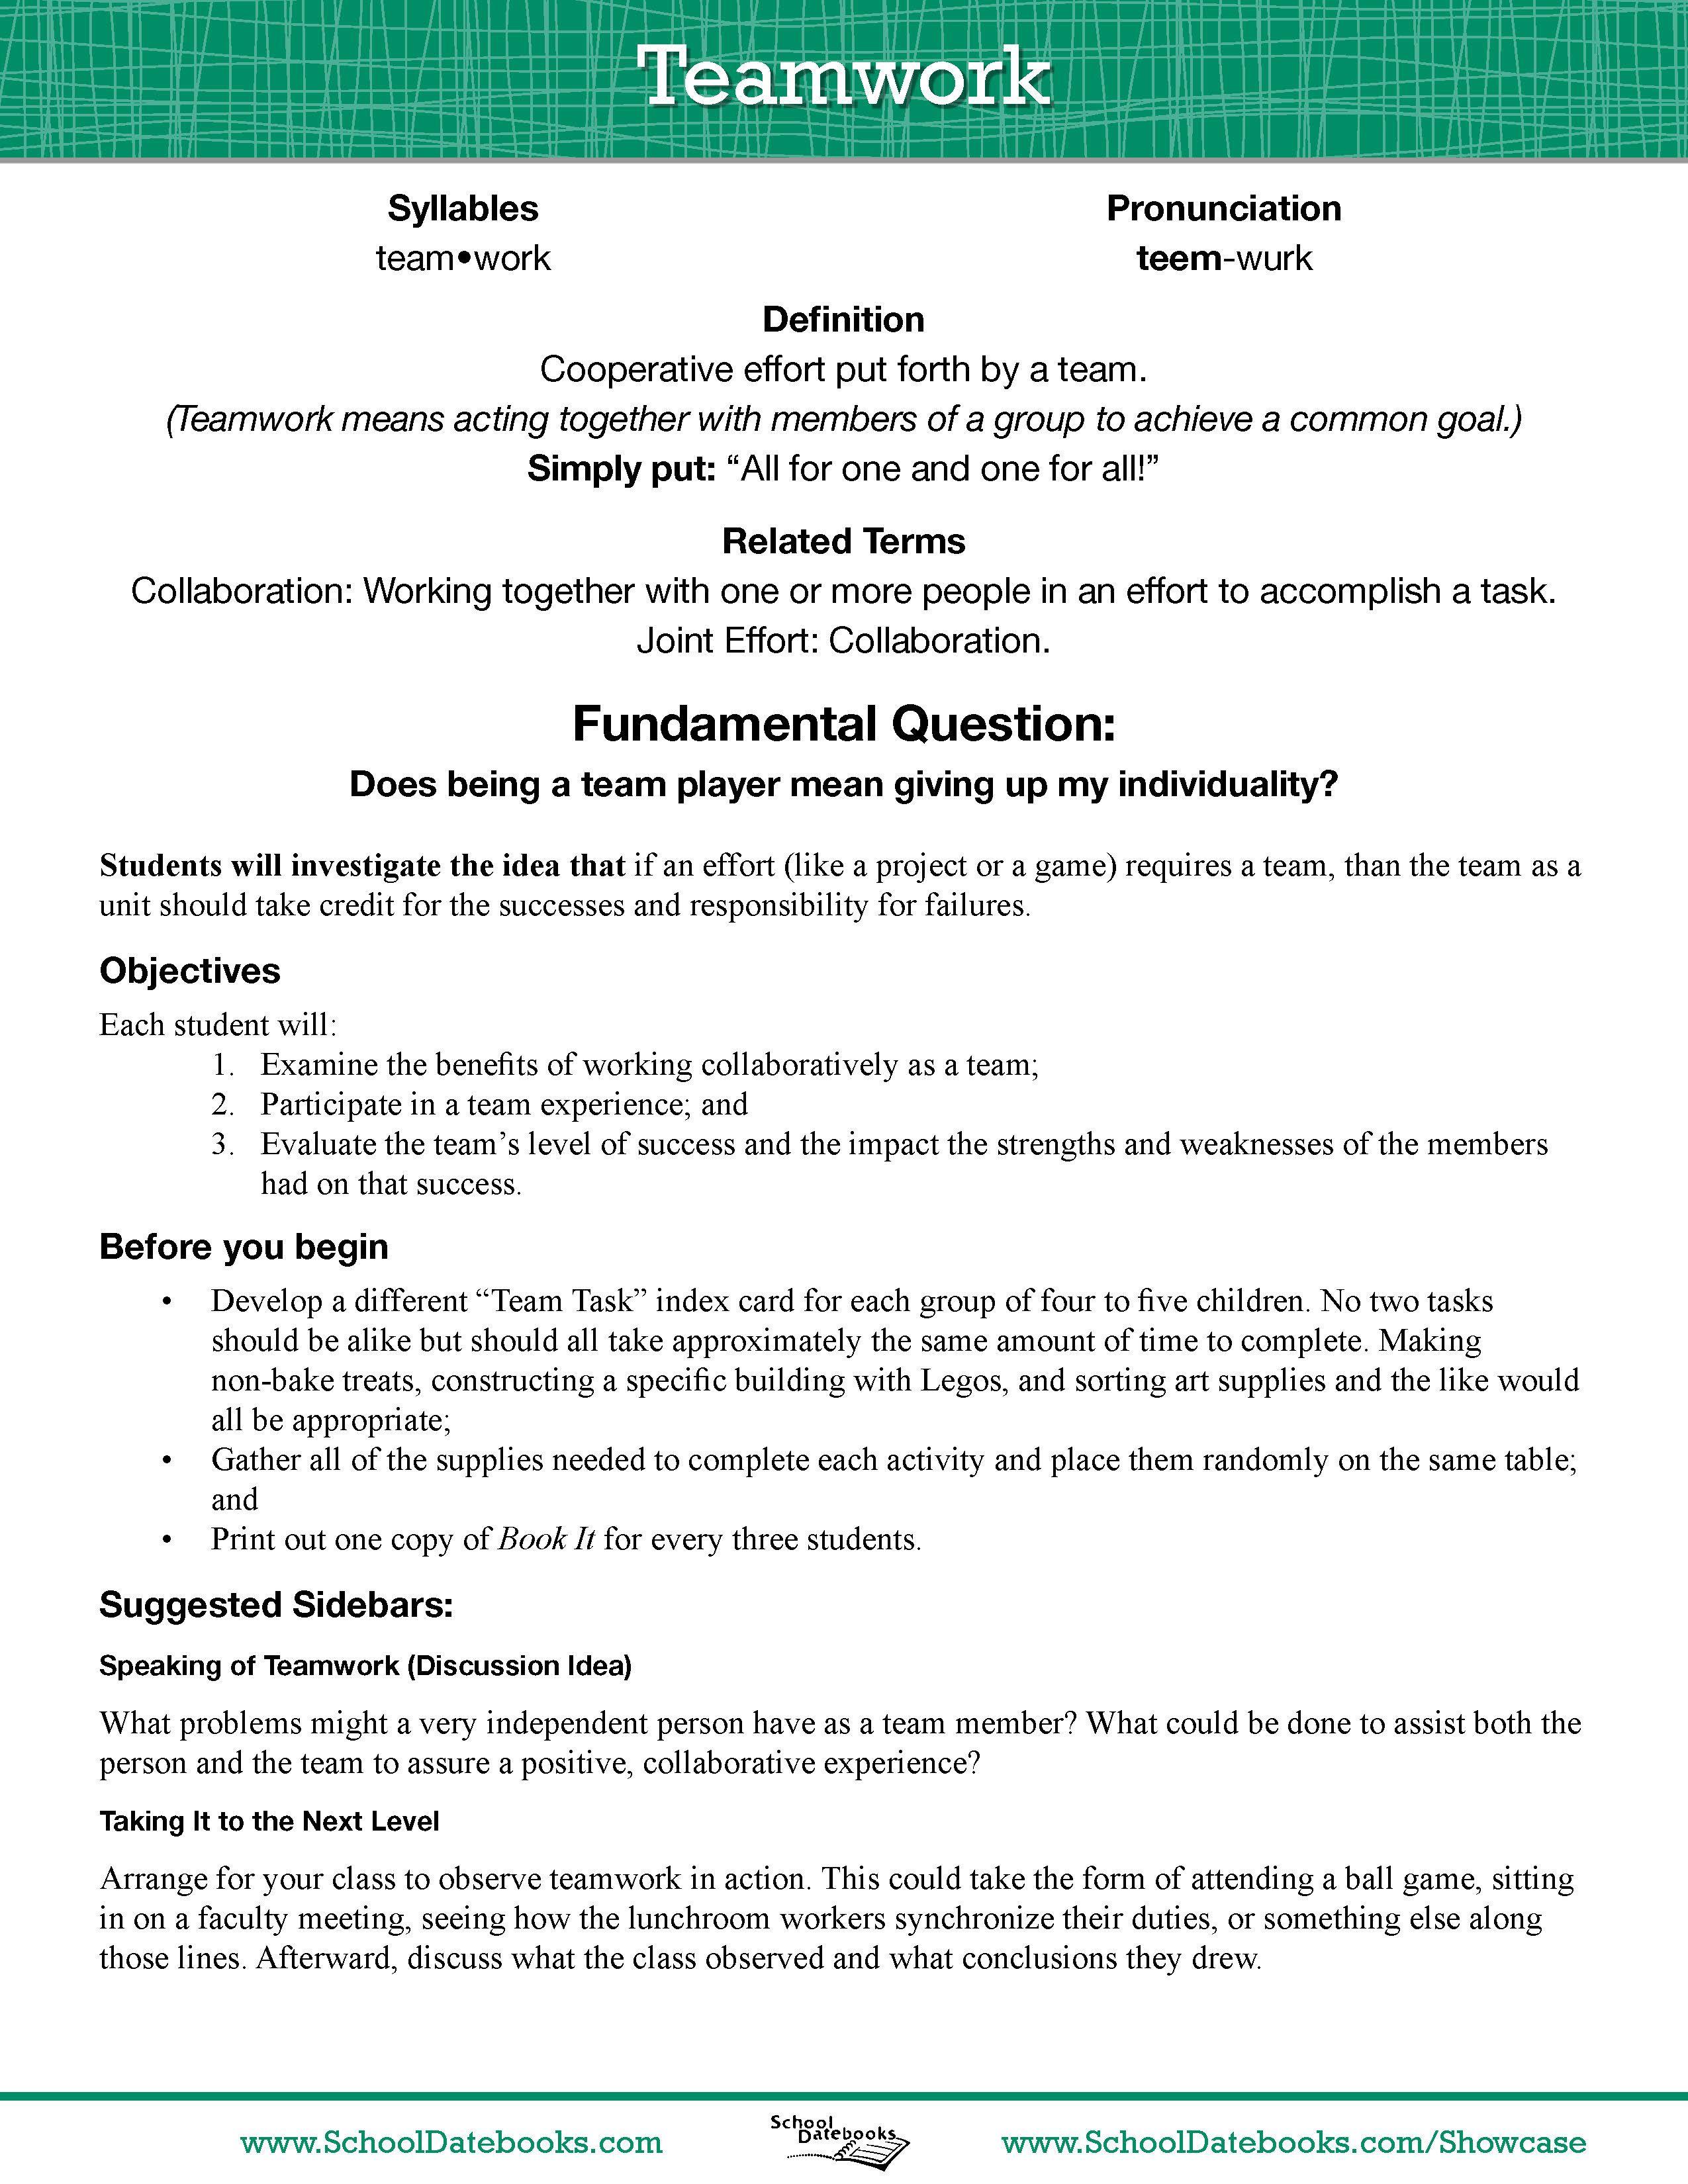 teamwork essay free